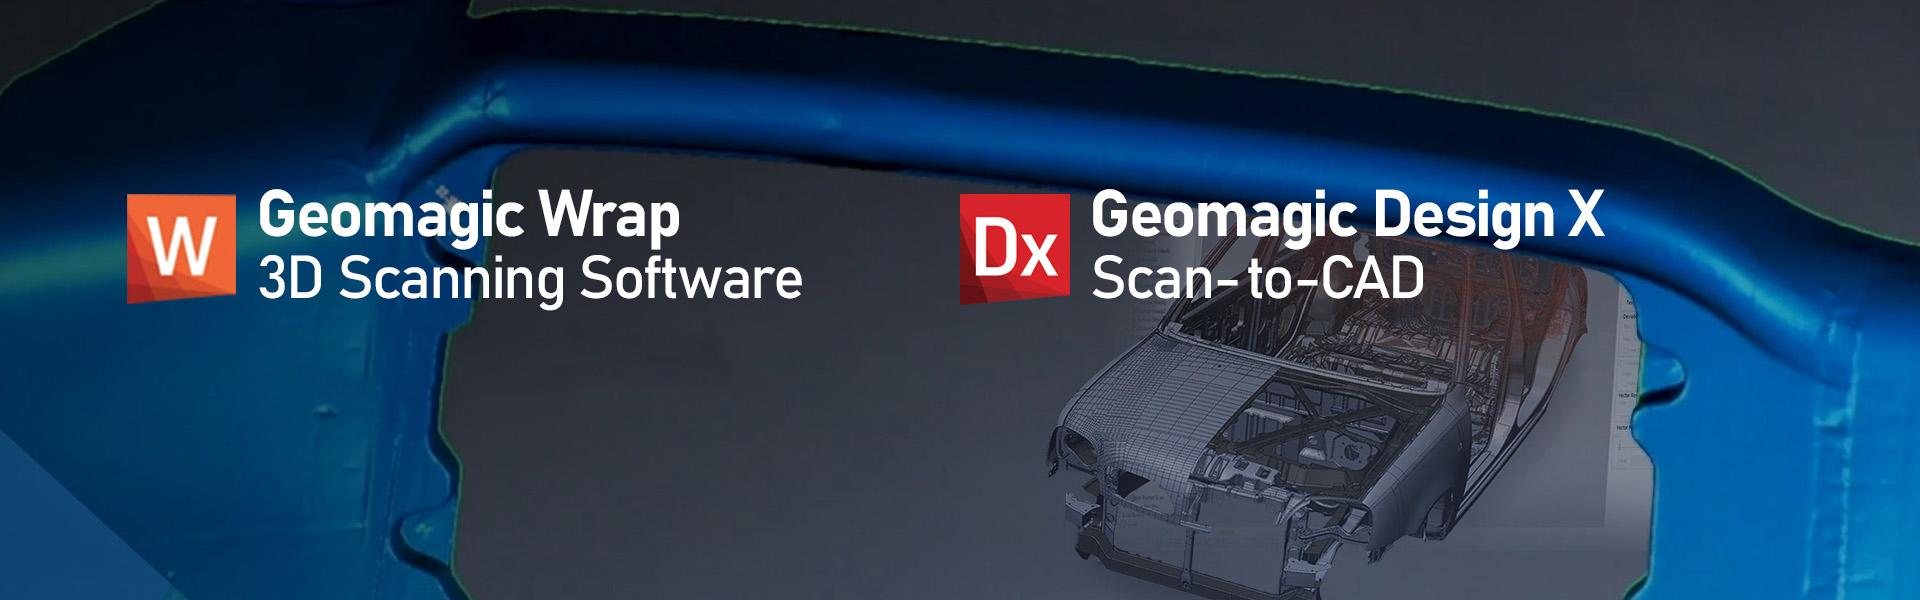 Geomagic Wrap DX software